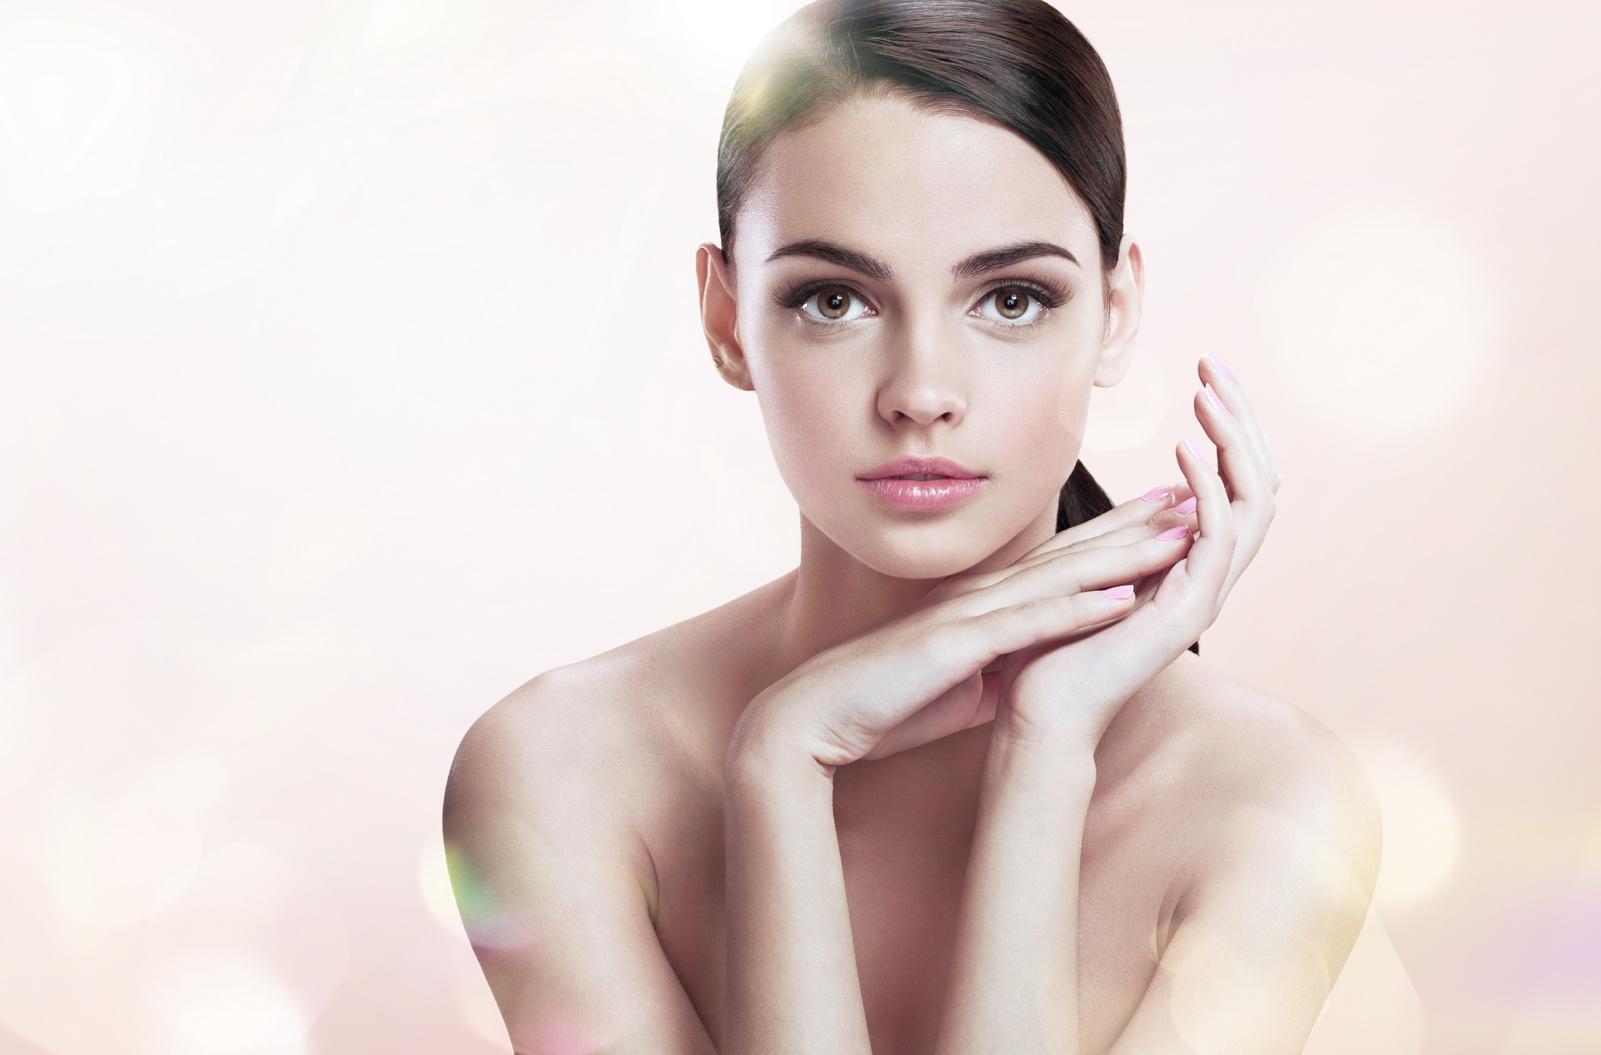 28 best La burbu images on Pinterest | Fine women, Good